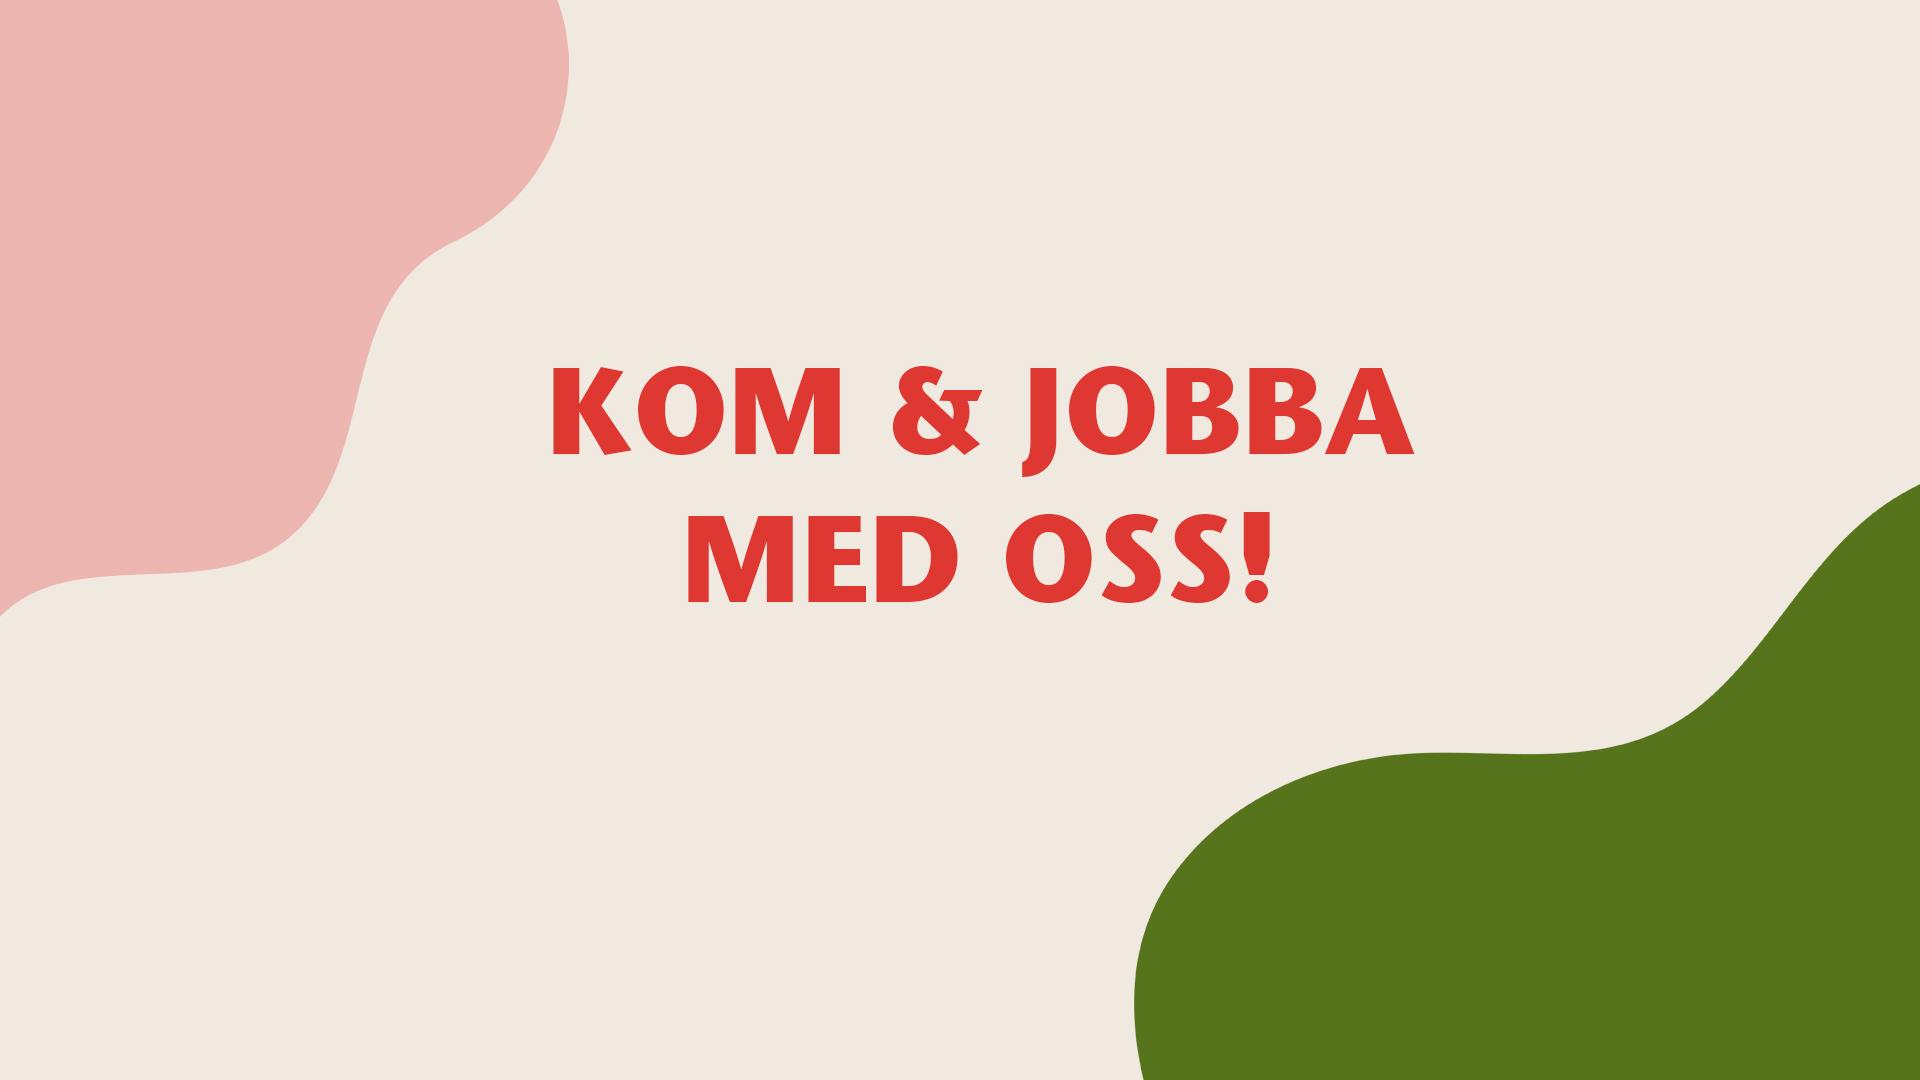 Sveriges modernaste secondhand-butik behöver ny butikschef